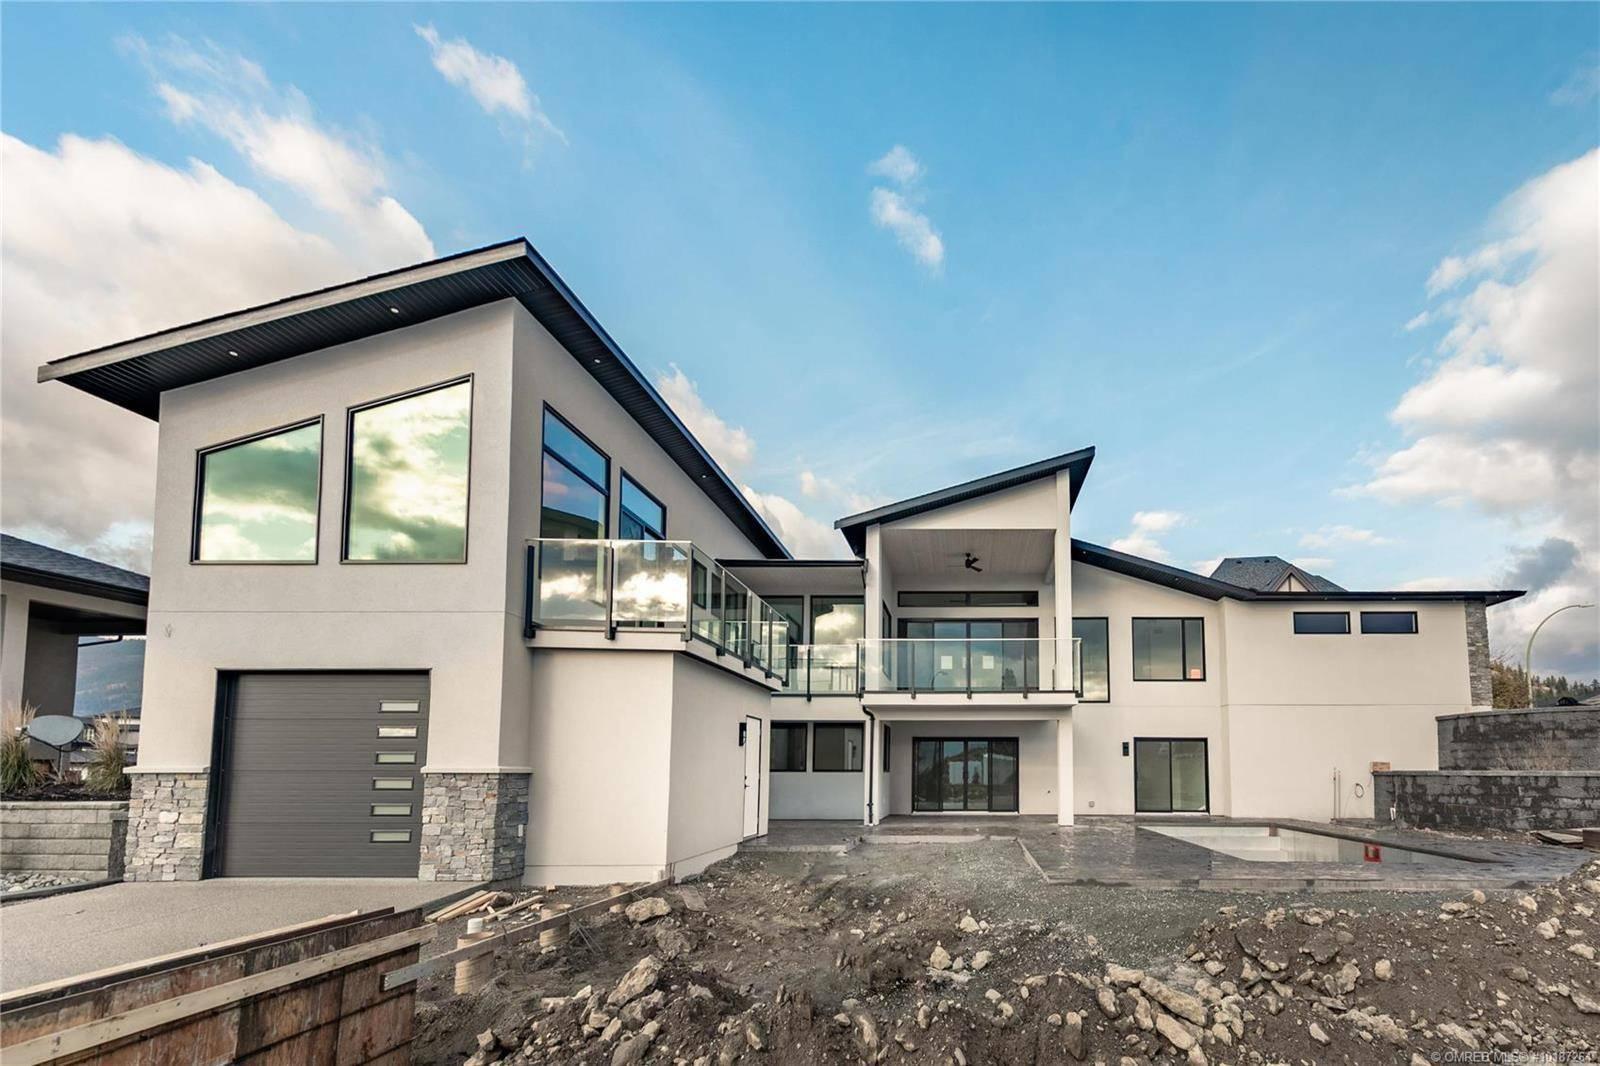 House for sale at 3276 Vineyard View Dr West Kelowna British Columbia - MLS: 10187264